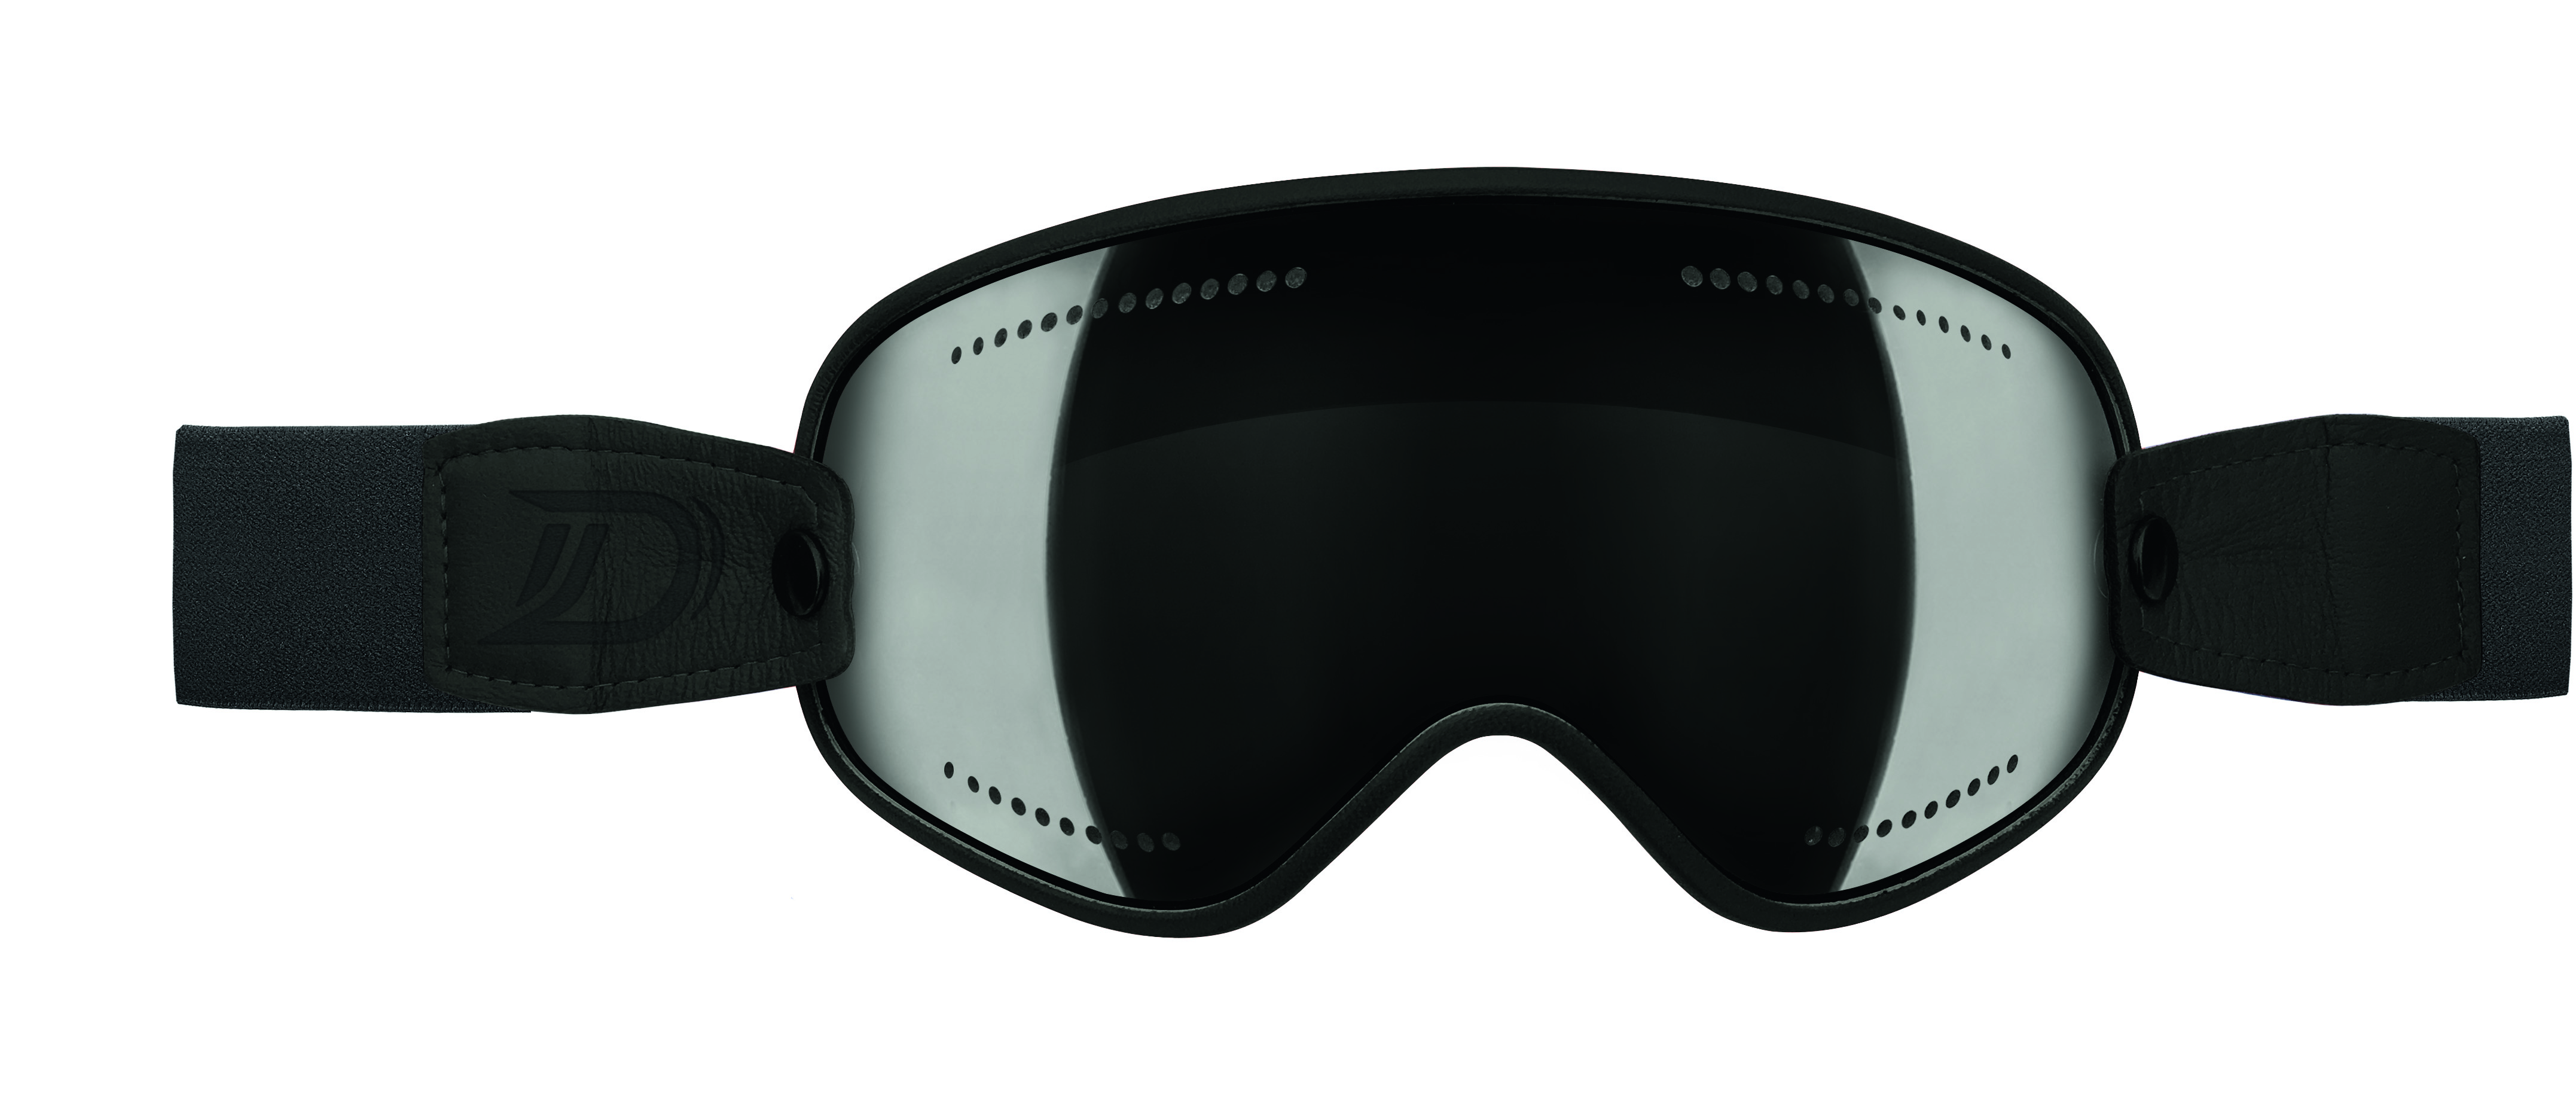 Deneriaz Saslong ski goggles